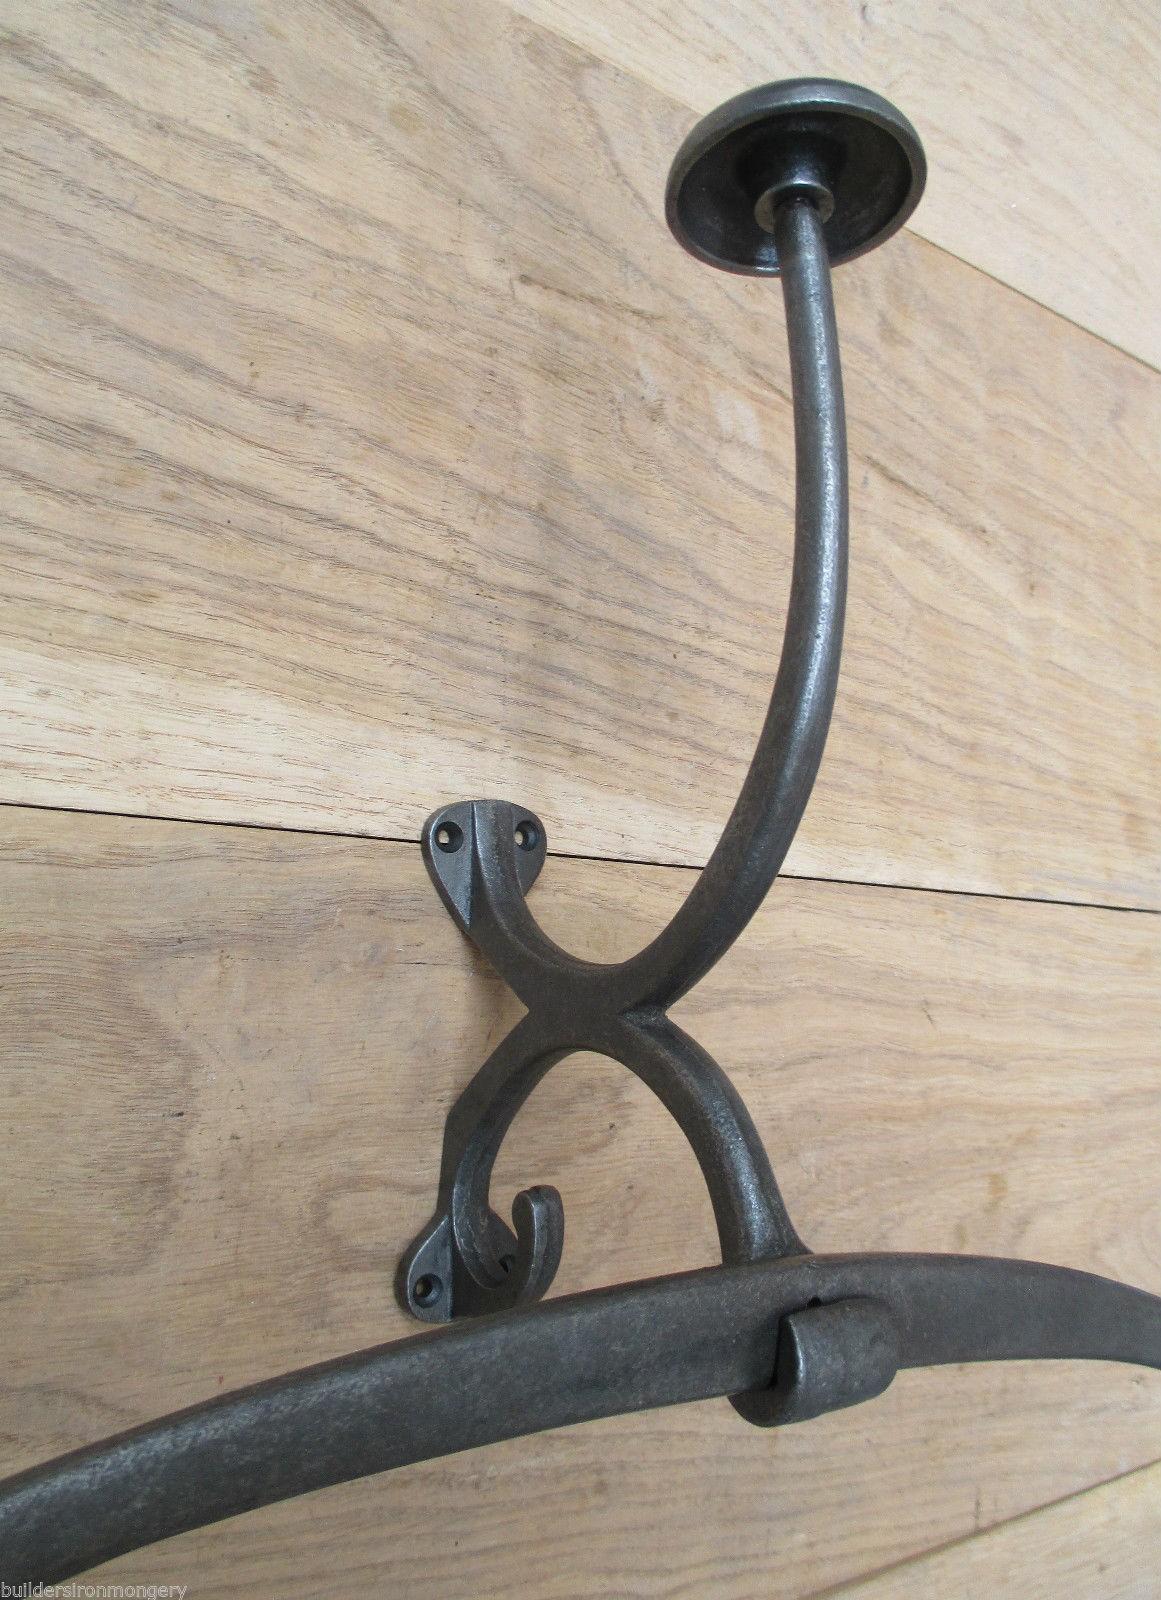 OCEAN LINER Vintage rustic Clothes coat jacket hanger rack wall mounted stand